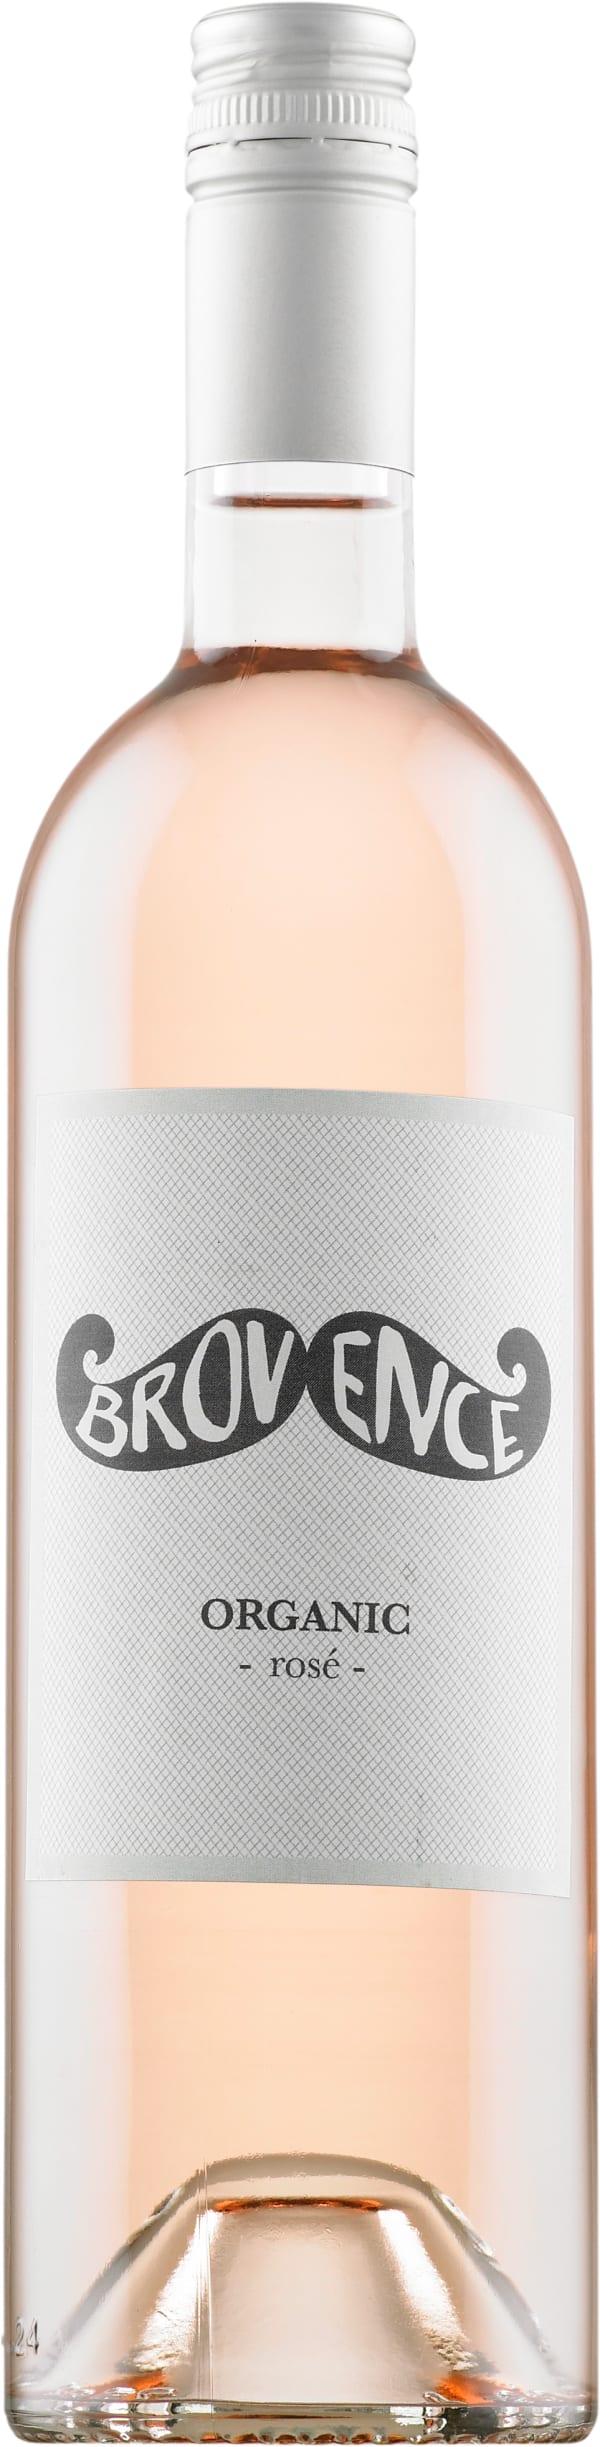 Brovence Organic Rosé 2019